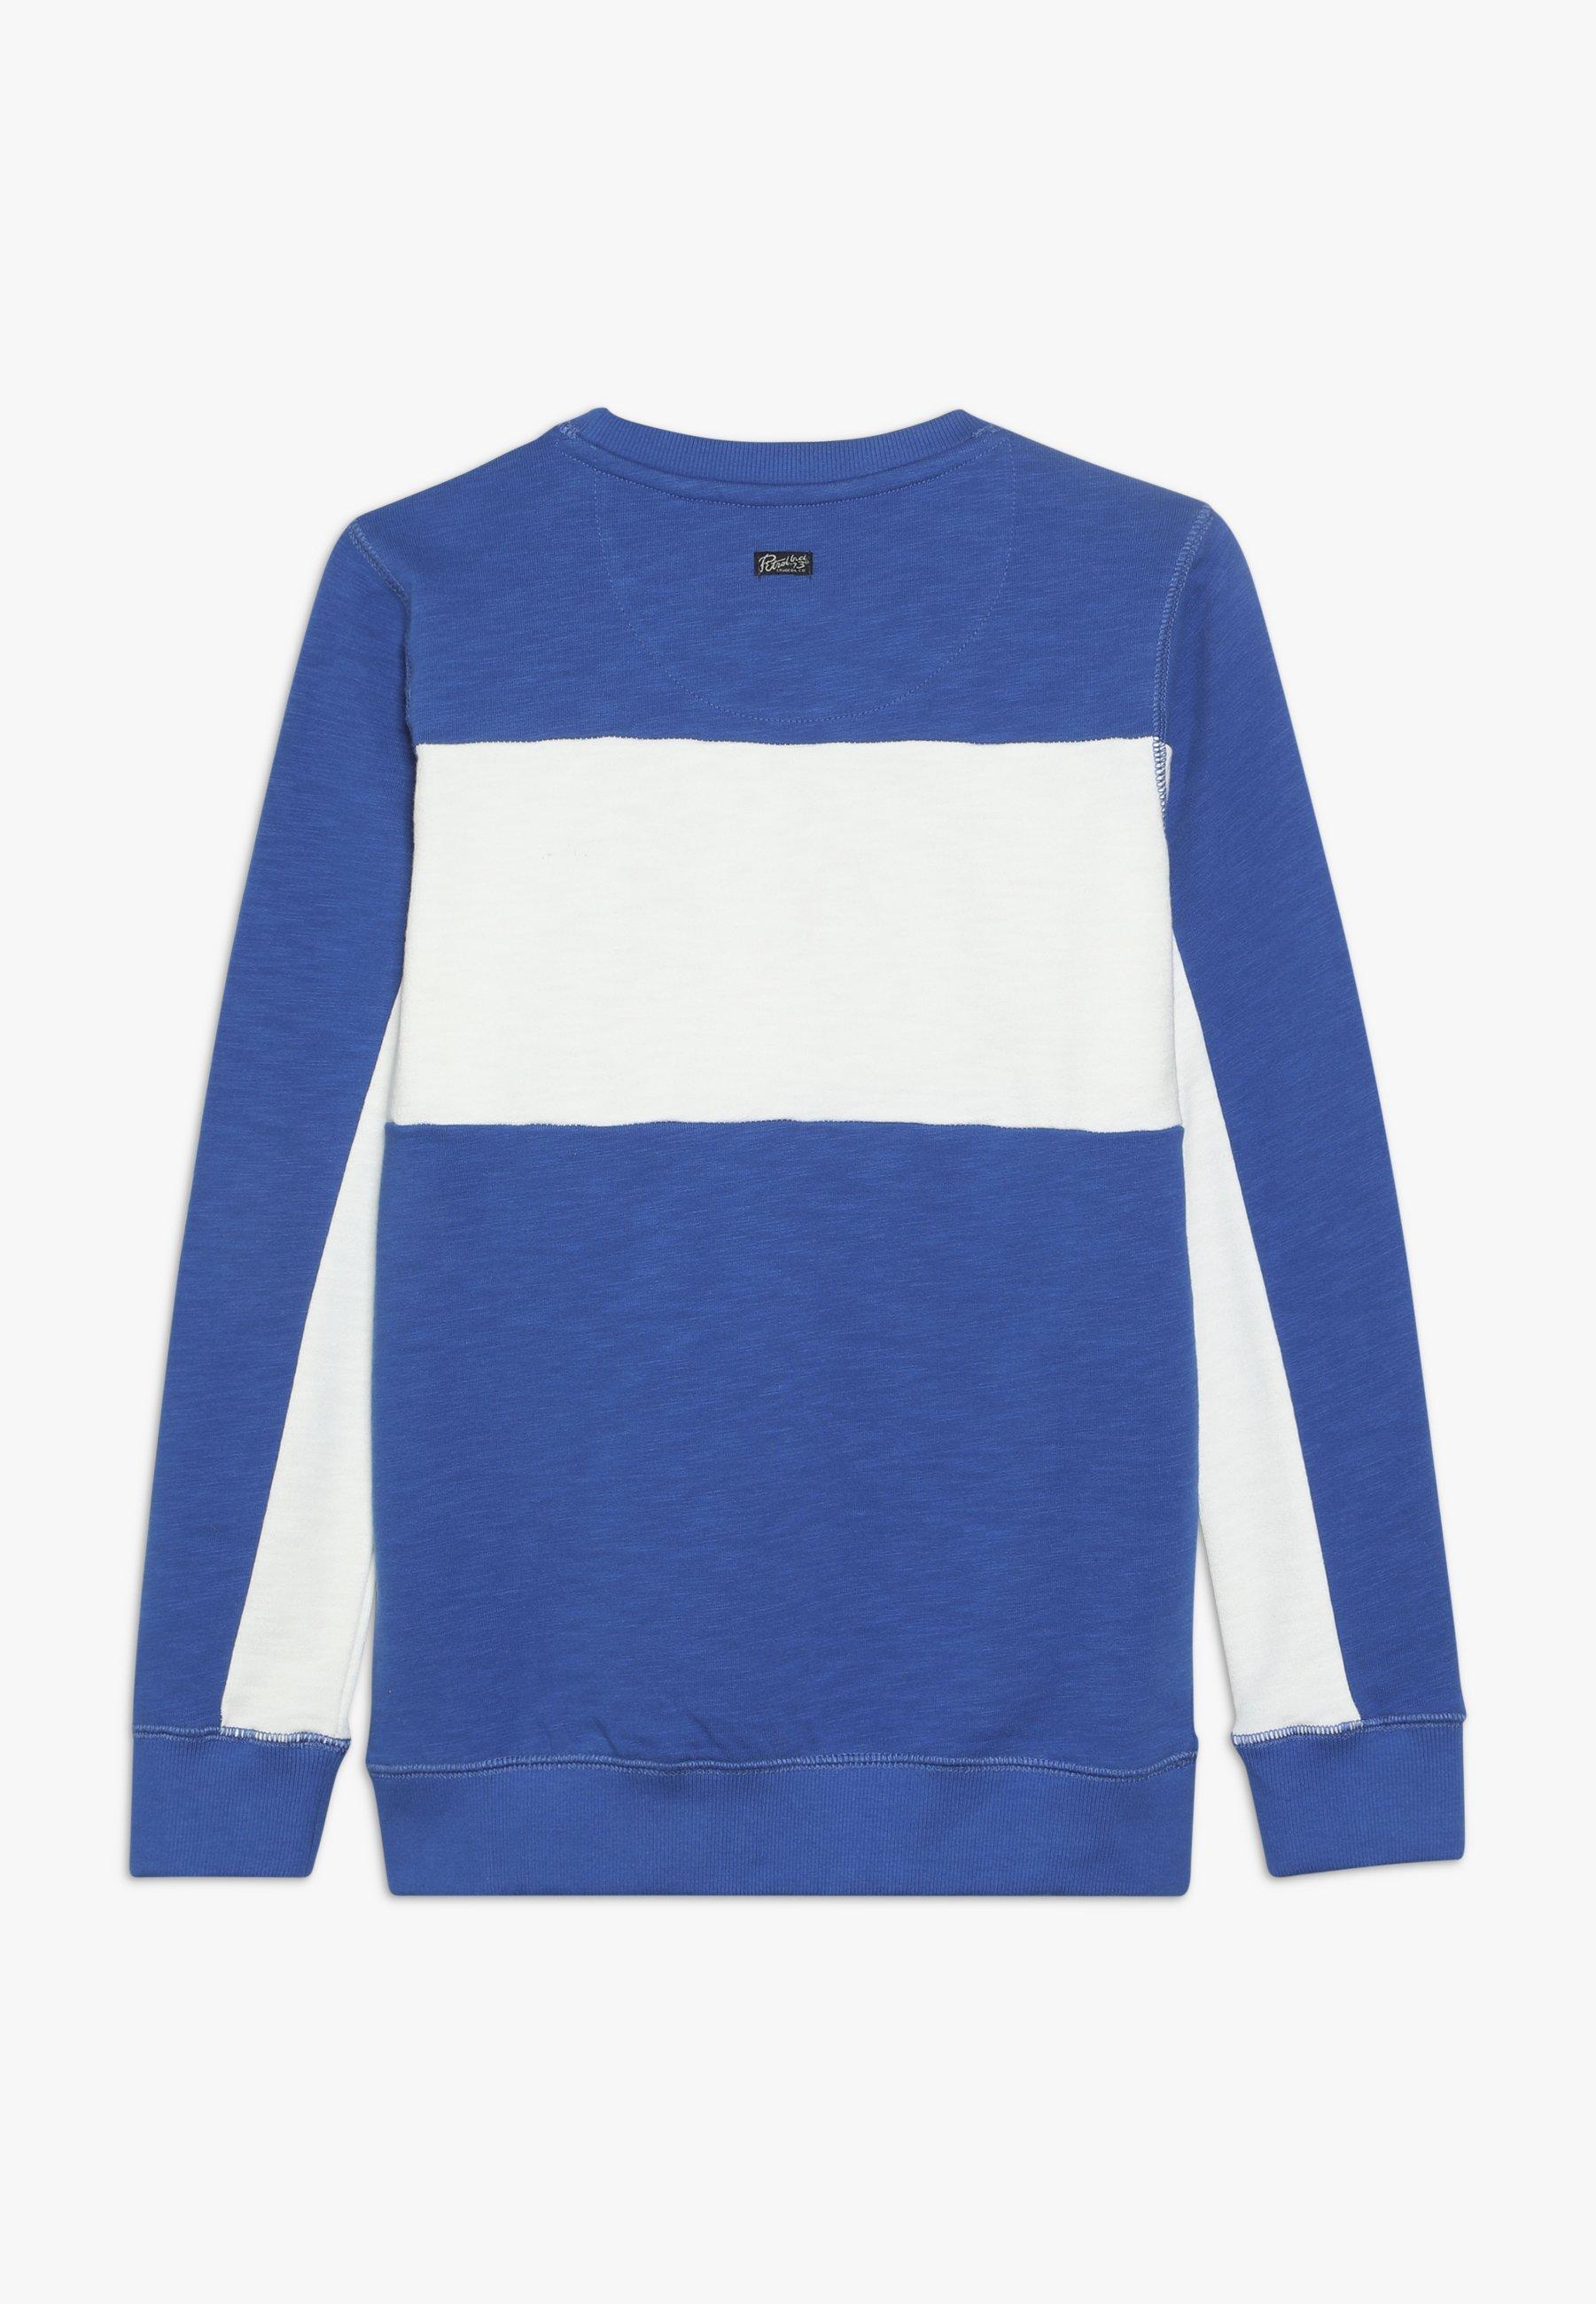 Große Förderung Petrol Industries Sweatshirt - seascape | Damenbekleidung 2020